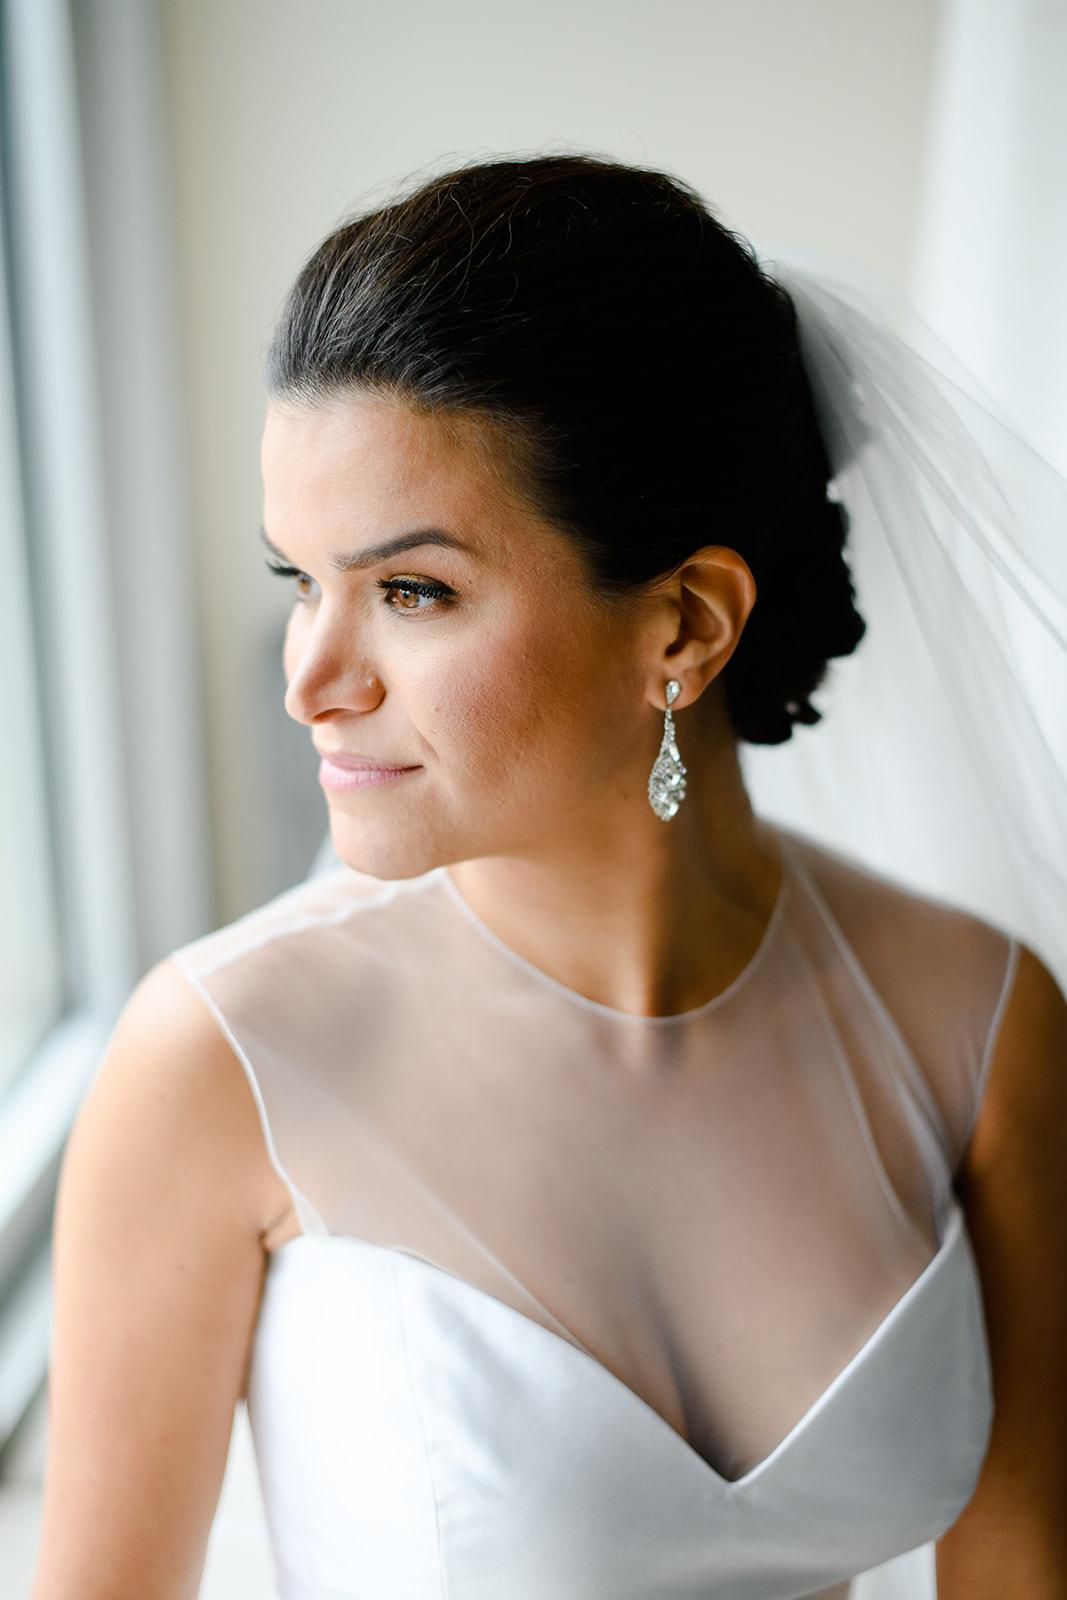 Minimalist bridal portrait near a window at the Four Seasons in Chicago